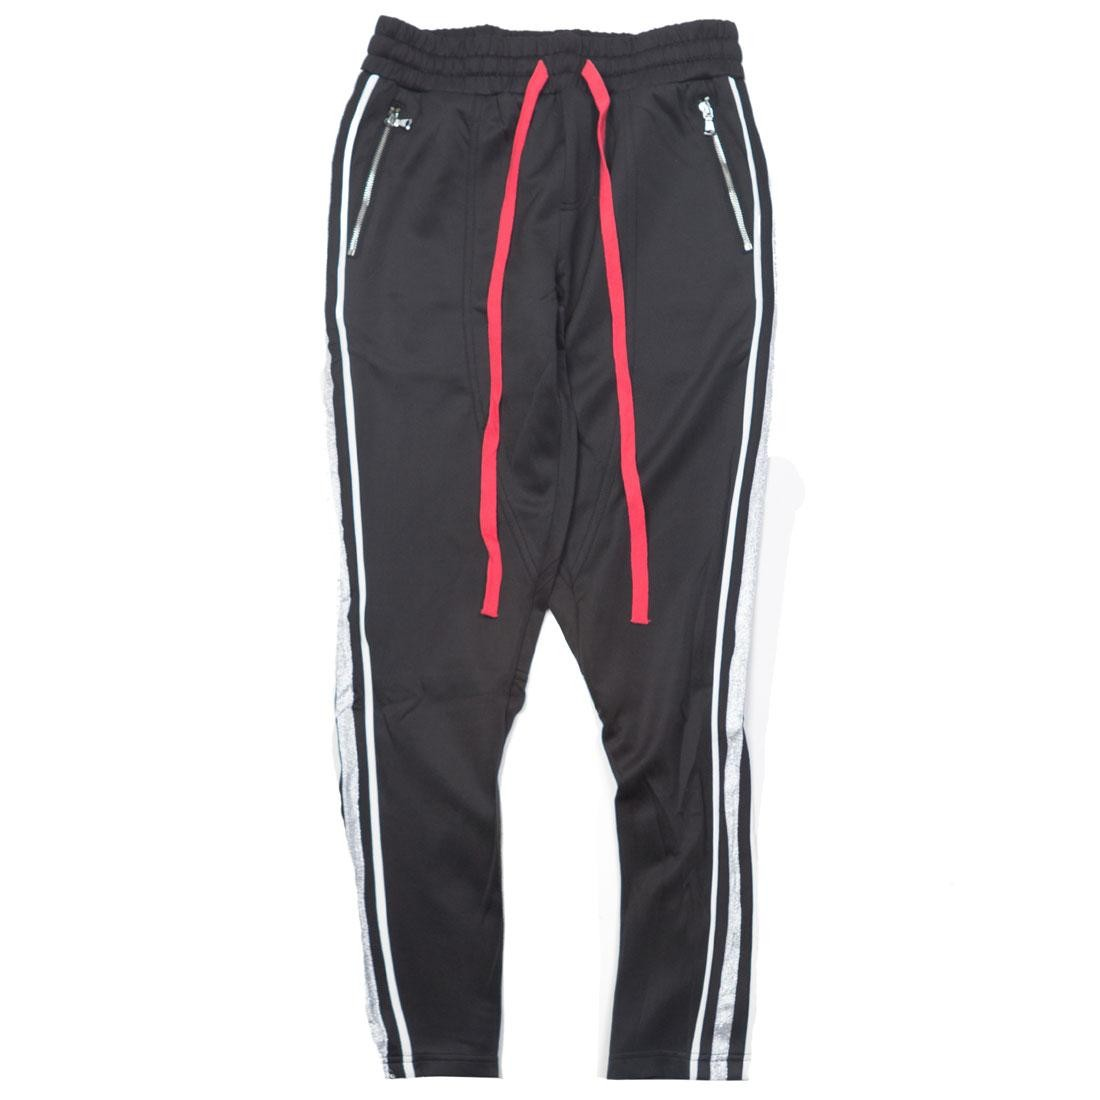 【 LIFTED ANCHORS MEN JENNER PANTS BLACK WHITE 】 メンズファッション ズボン パンツ 送料無料